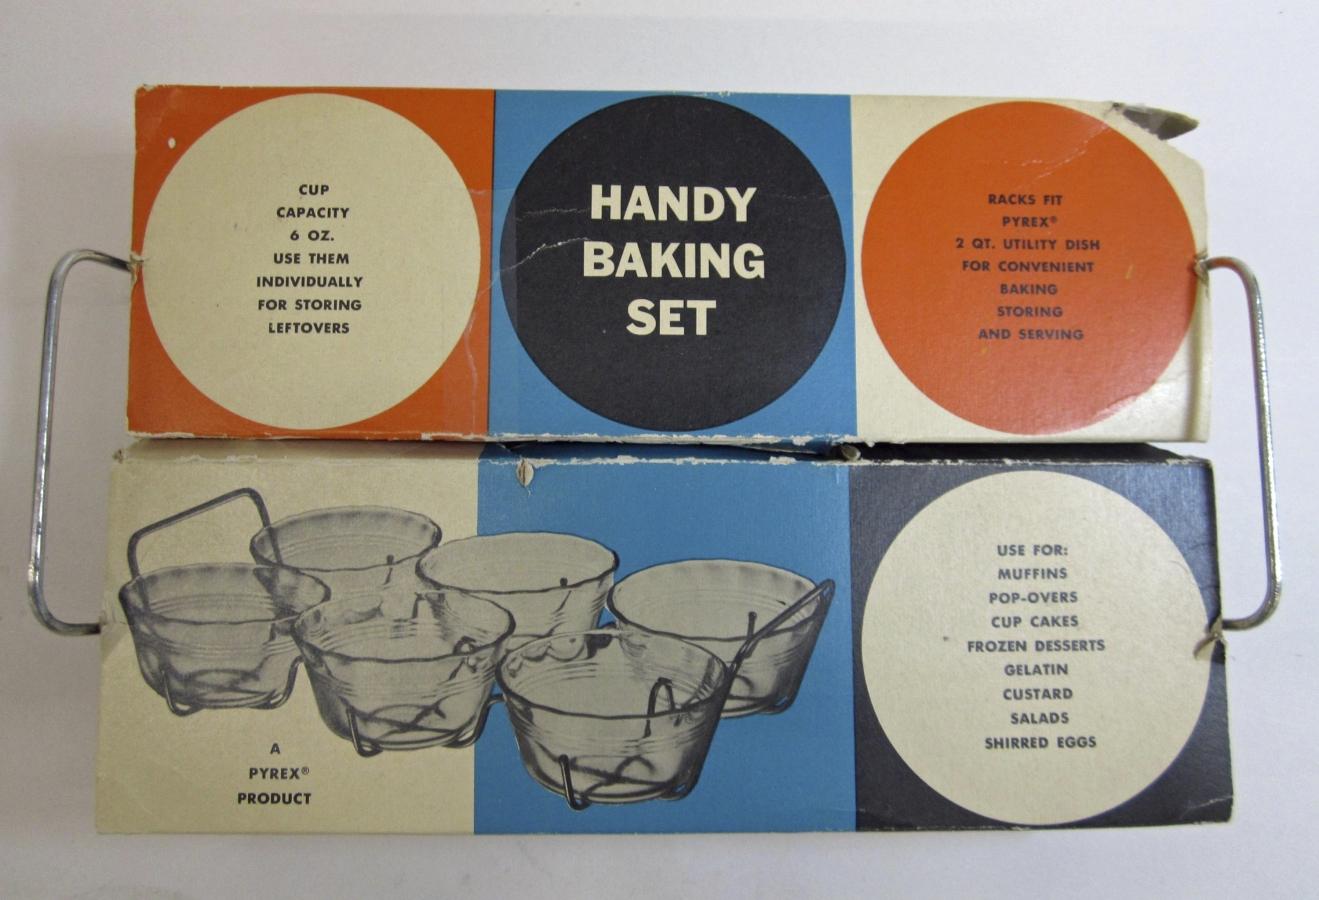 Pyrex Handy Baking Set in Original Packaging